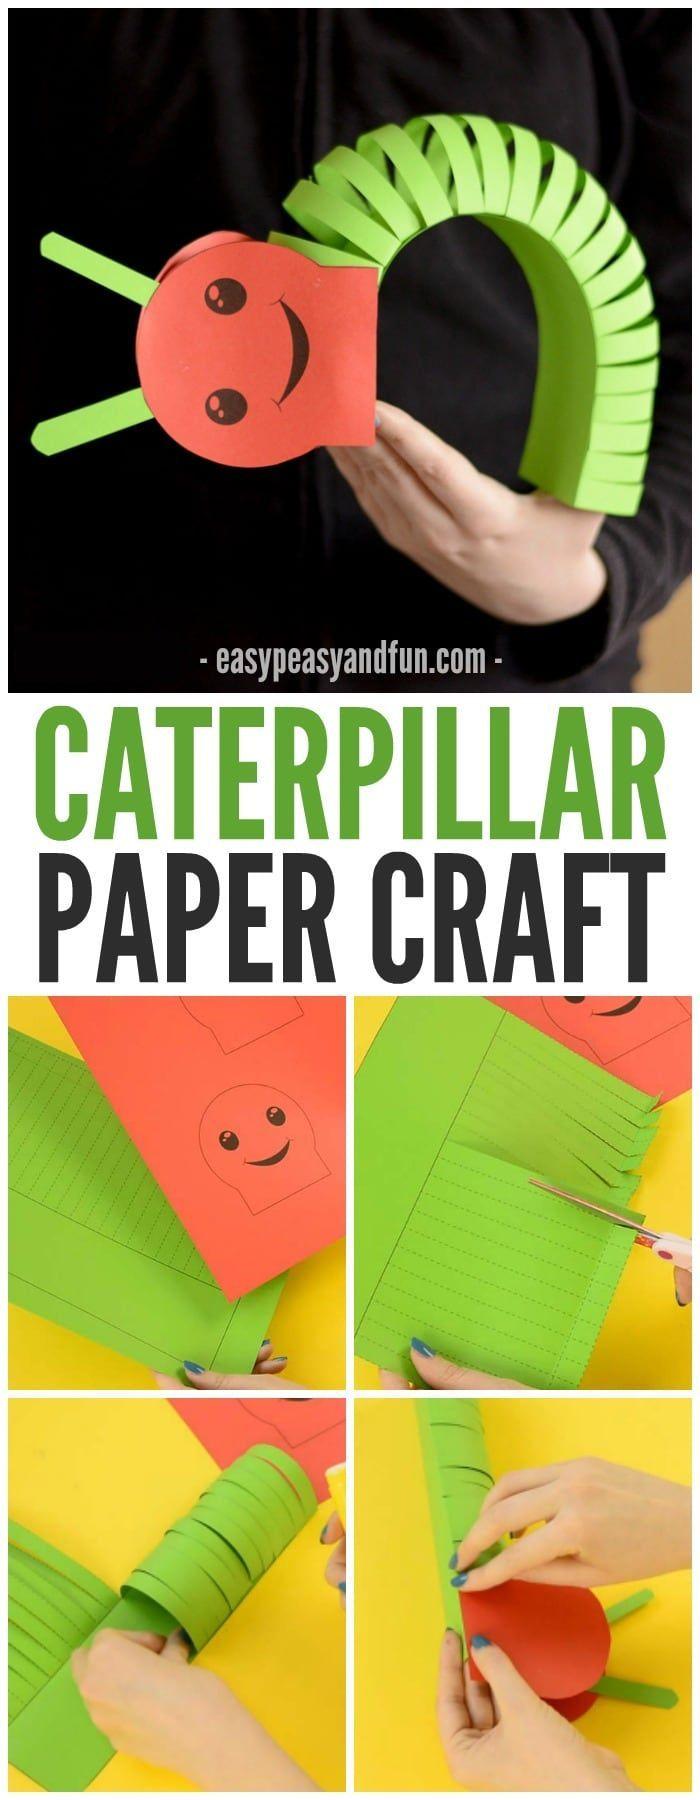 Cute Printable 3D Caterpillar Paper Craft for Kids. Great for toddler, preschool and kindergarten.